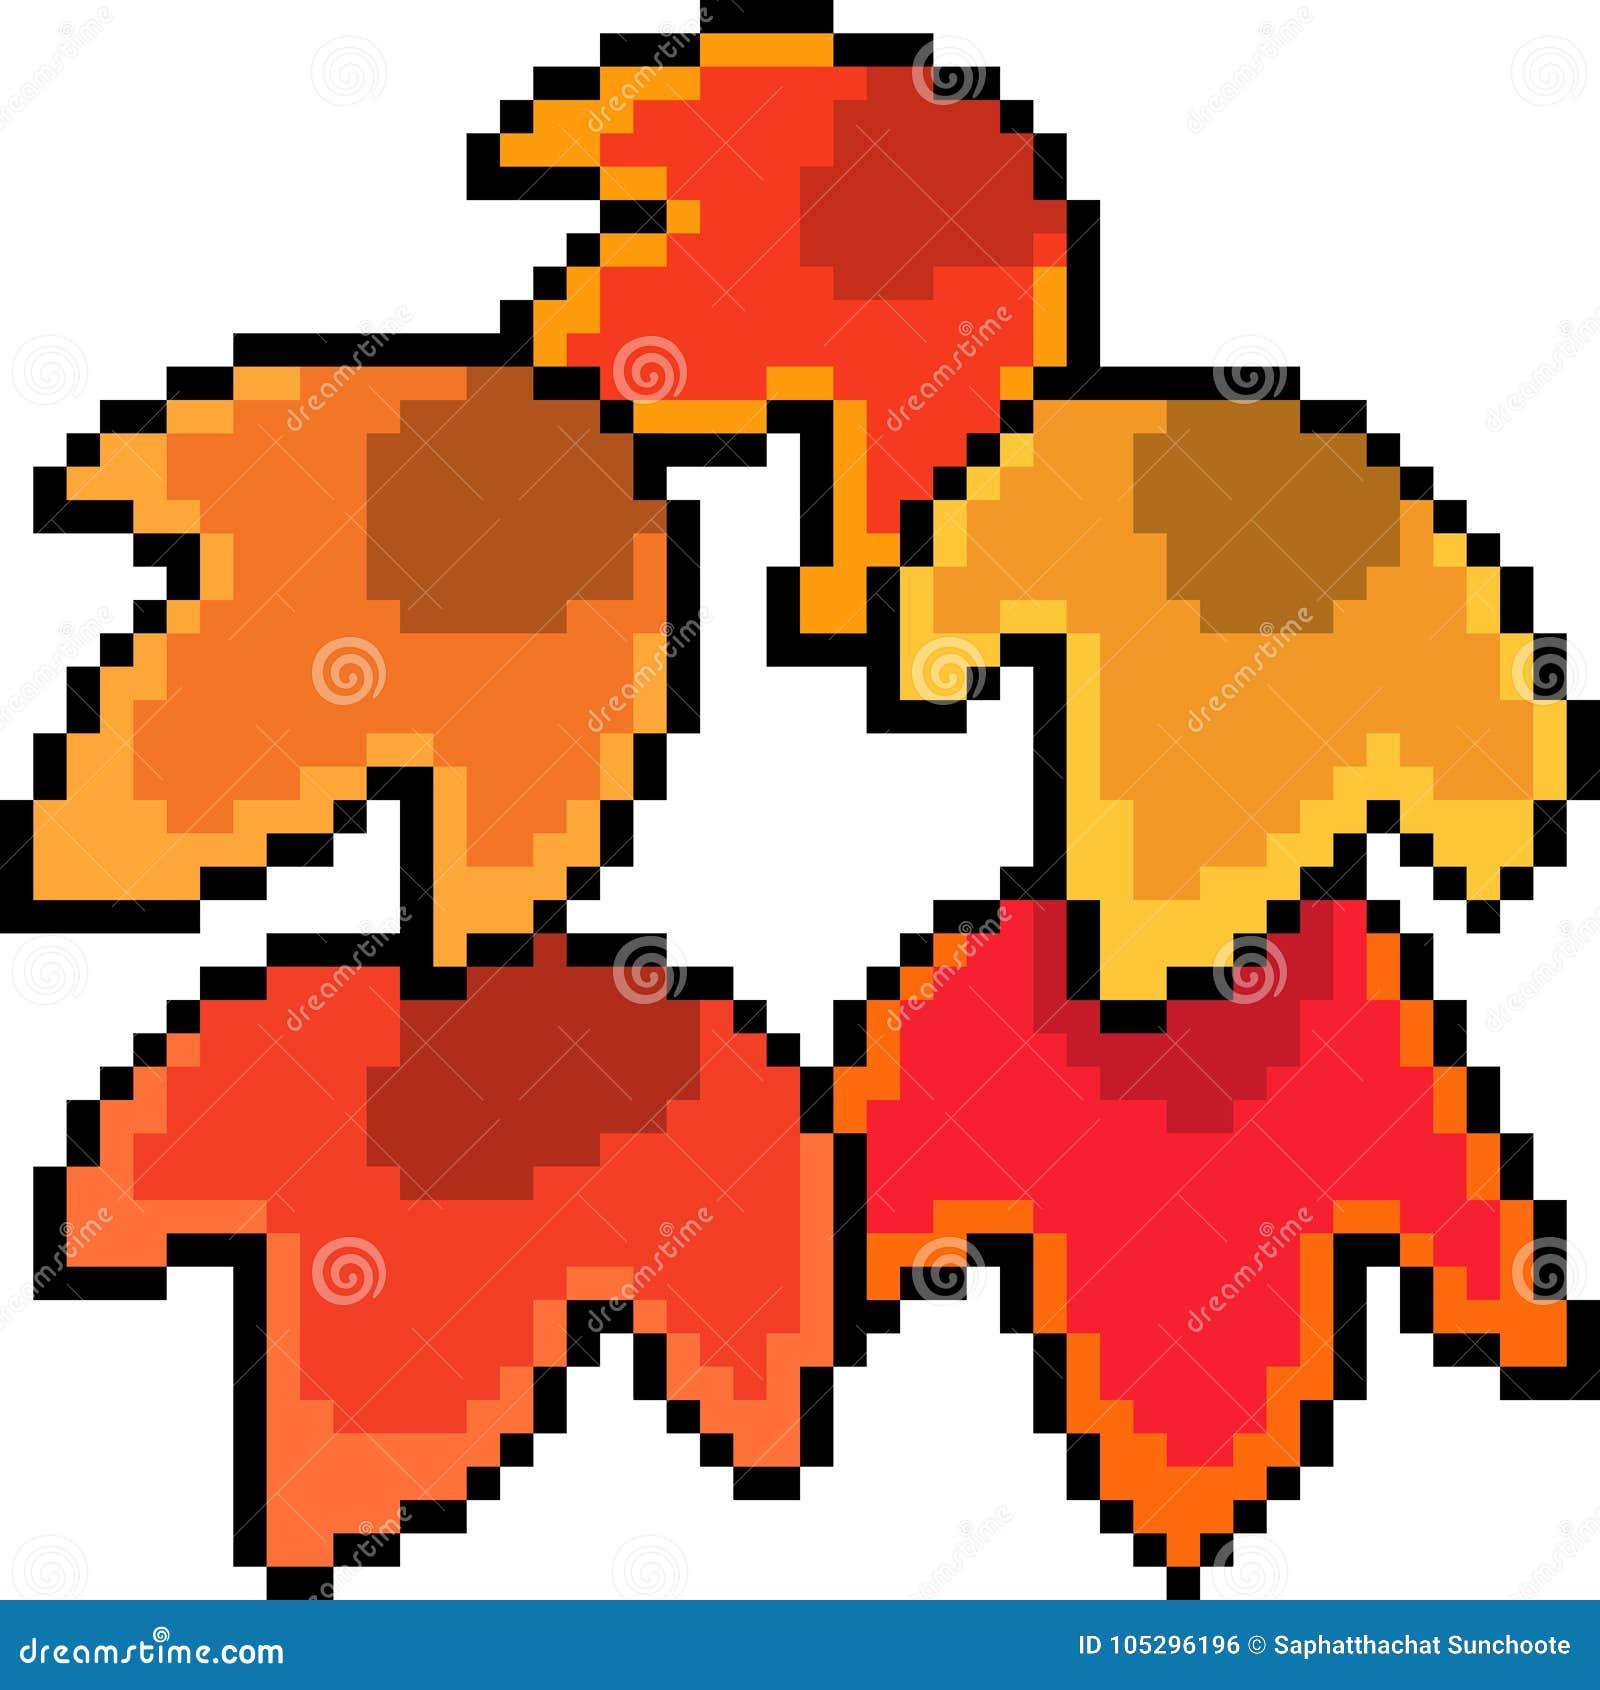 Feuille D Erable D Art De Pixel De Vecteur Illustration De Vecteur Illustration Du Cartoon Automne 105296196